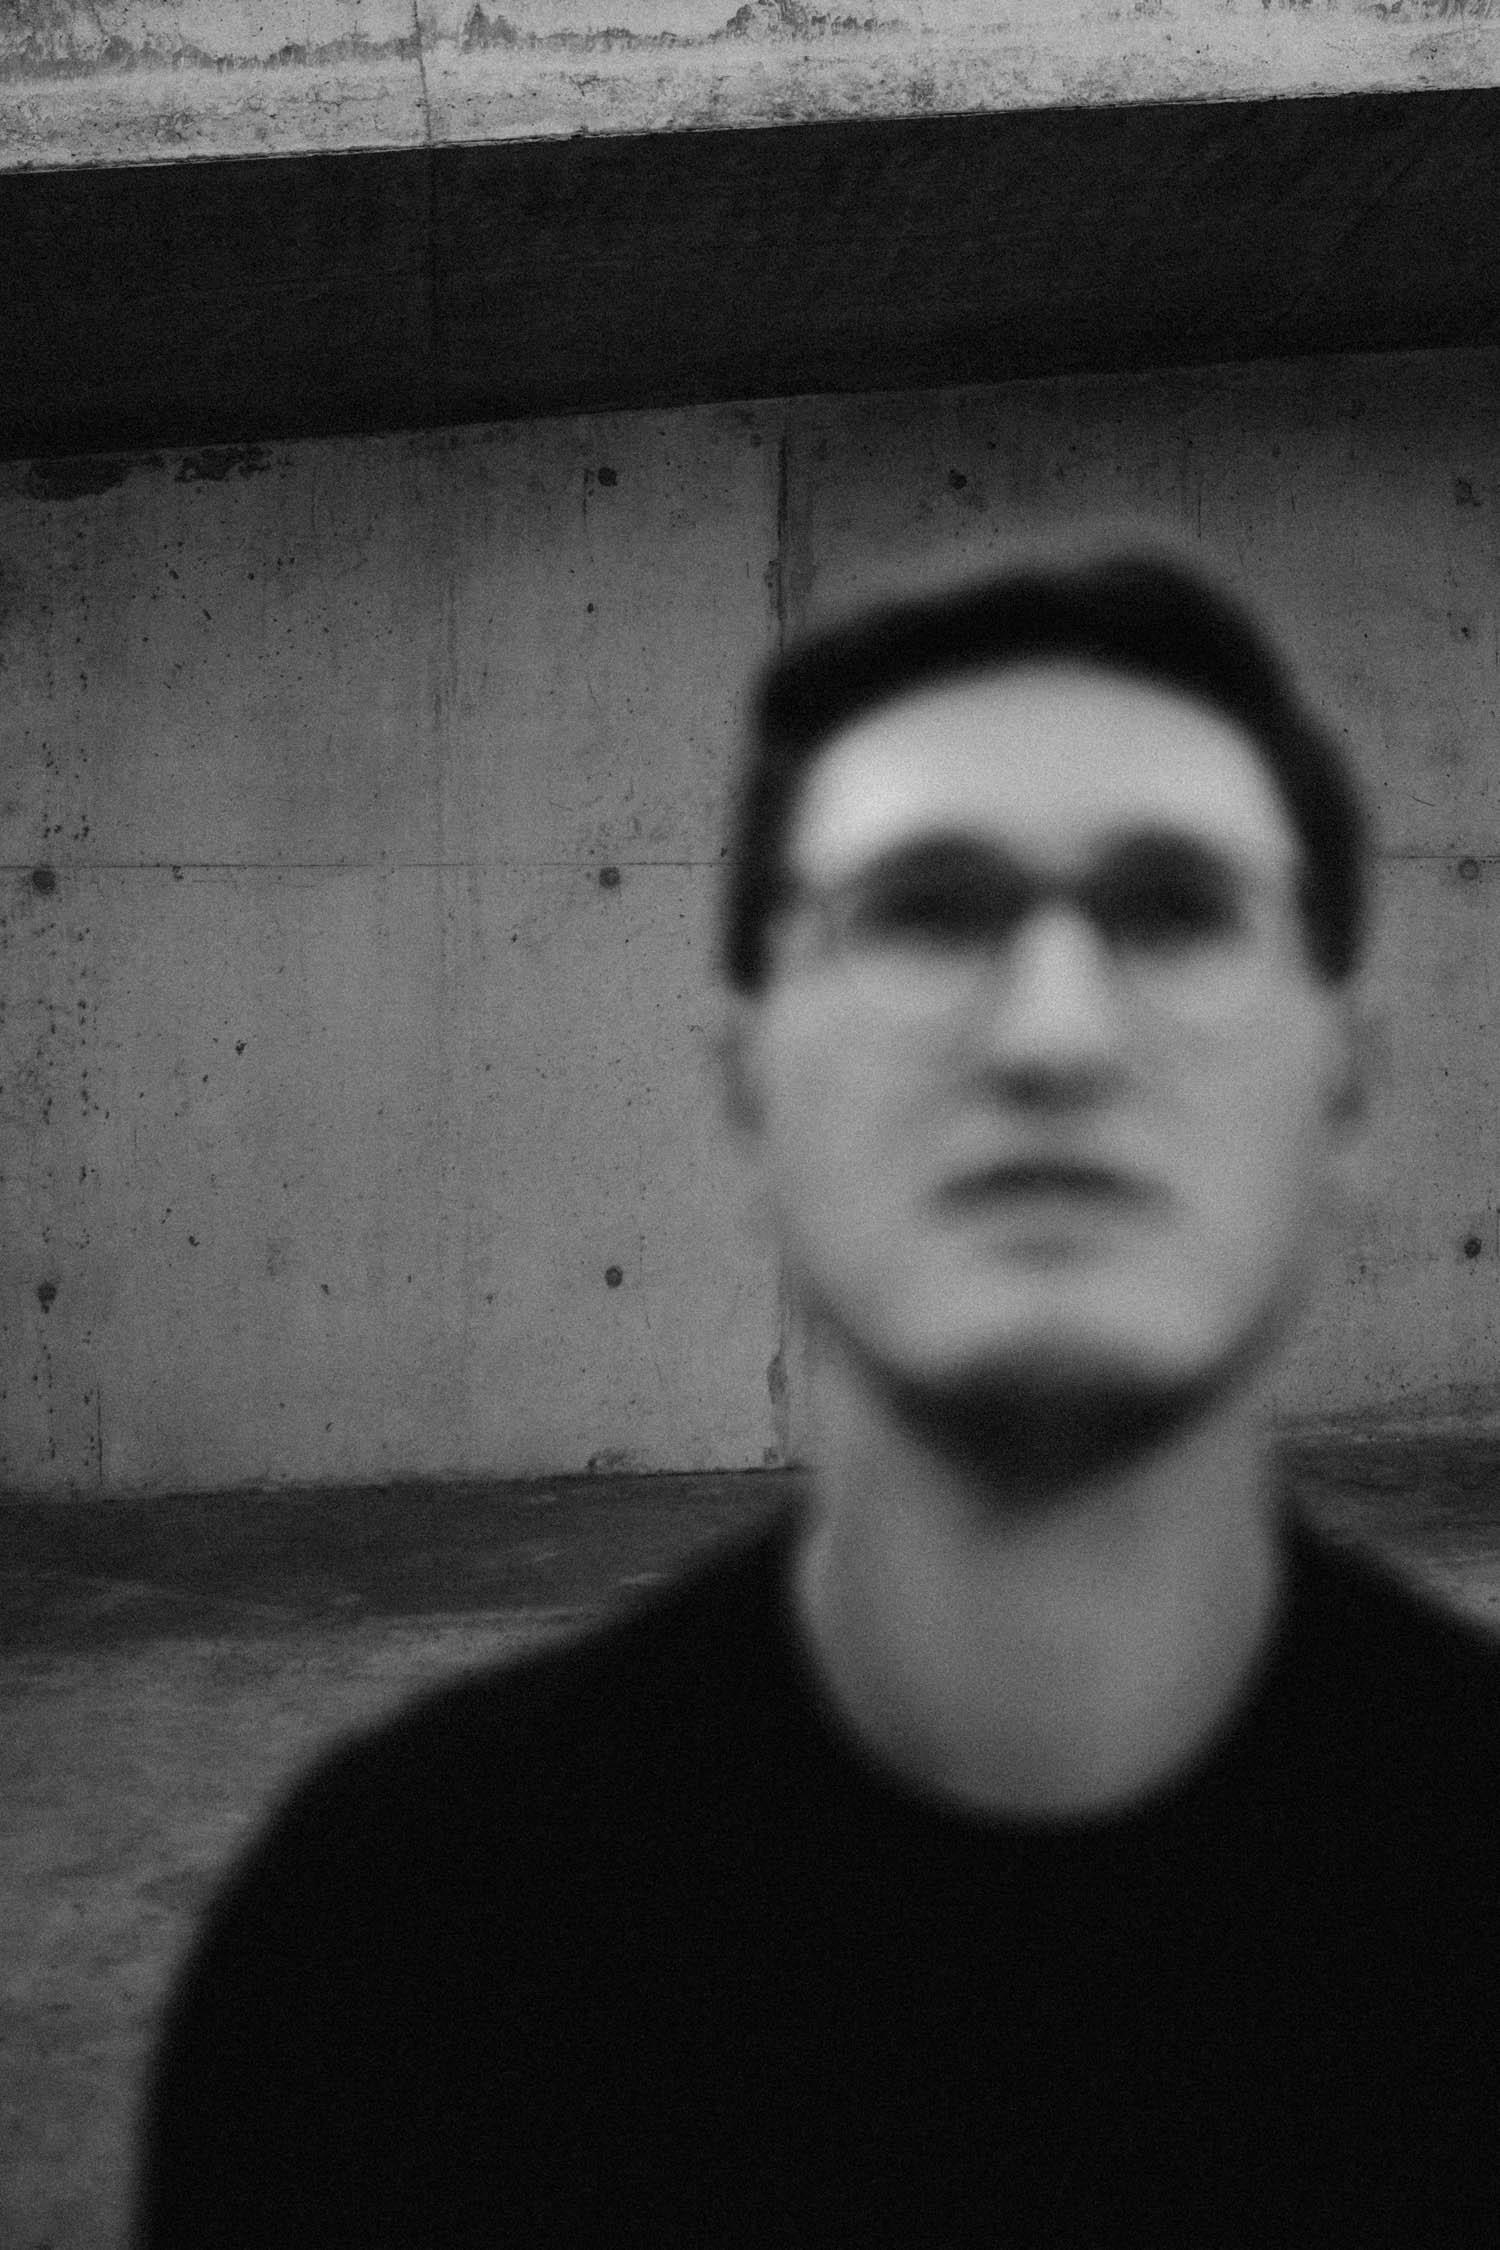 dj_mxm-hannover-hochzeit-dj-fotograf-filipp-romanovskij (10 von 10)